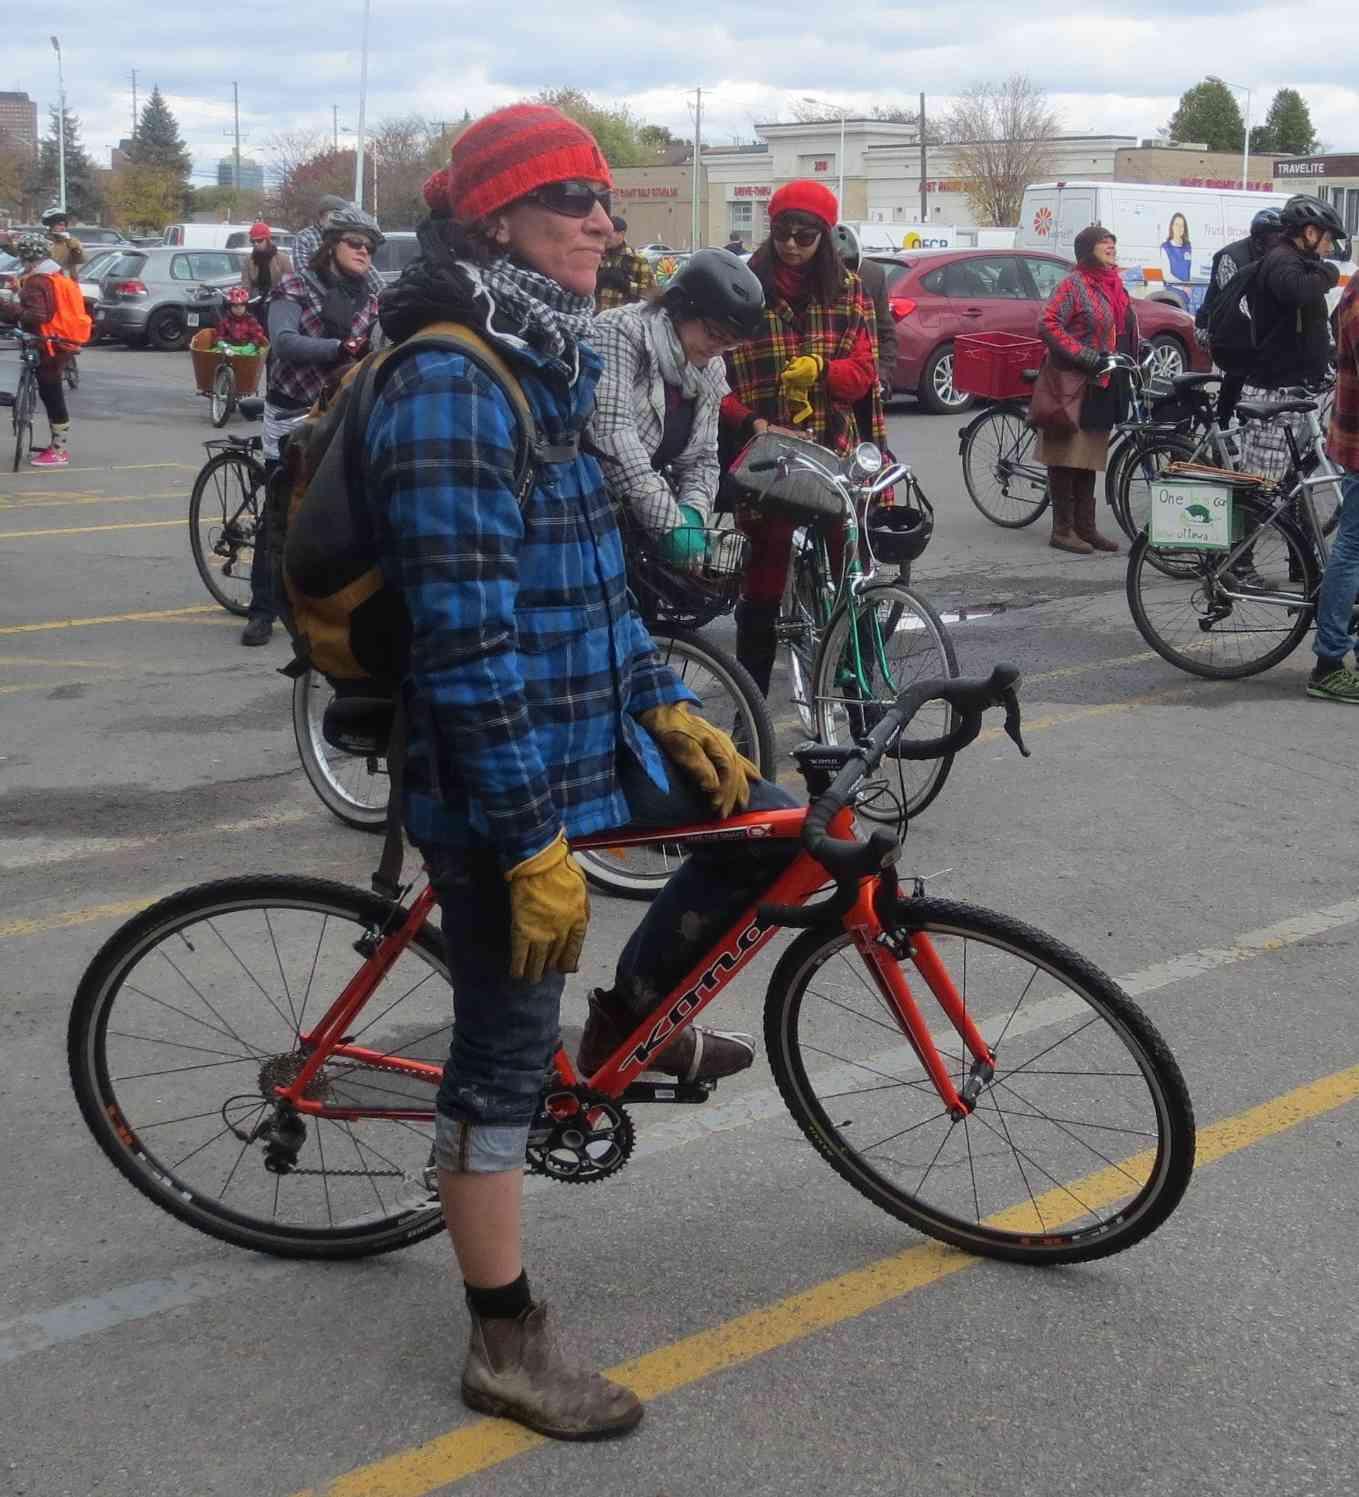 2013 10 27 Ottawa Plaid Parade – Hans Moor 16